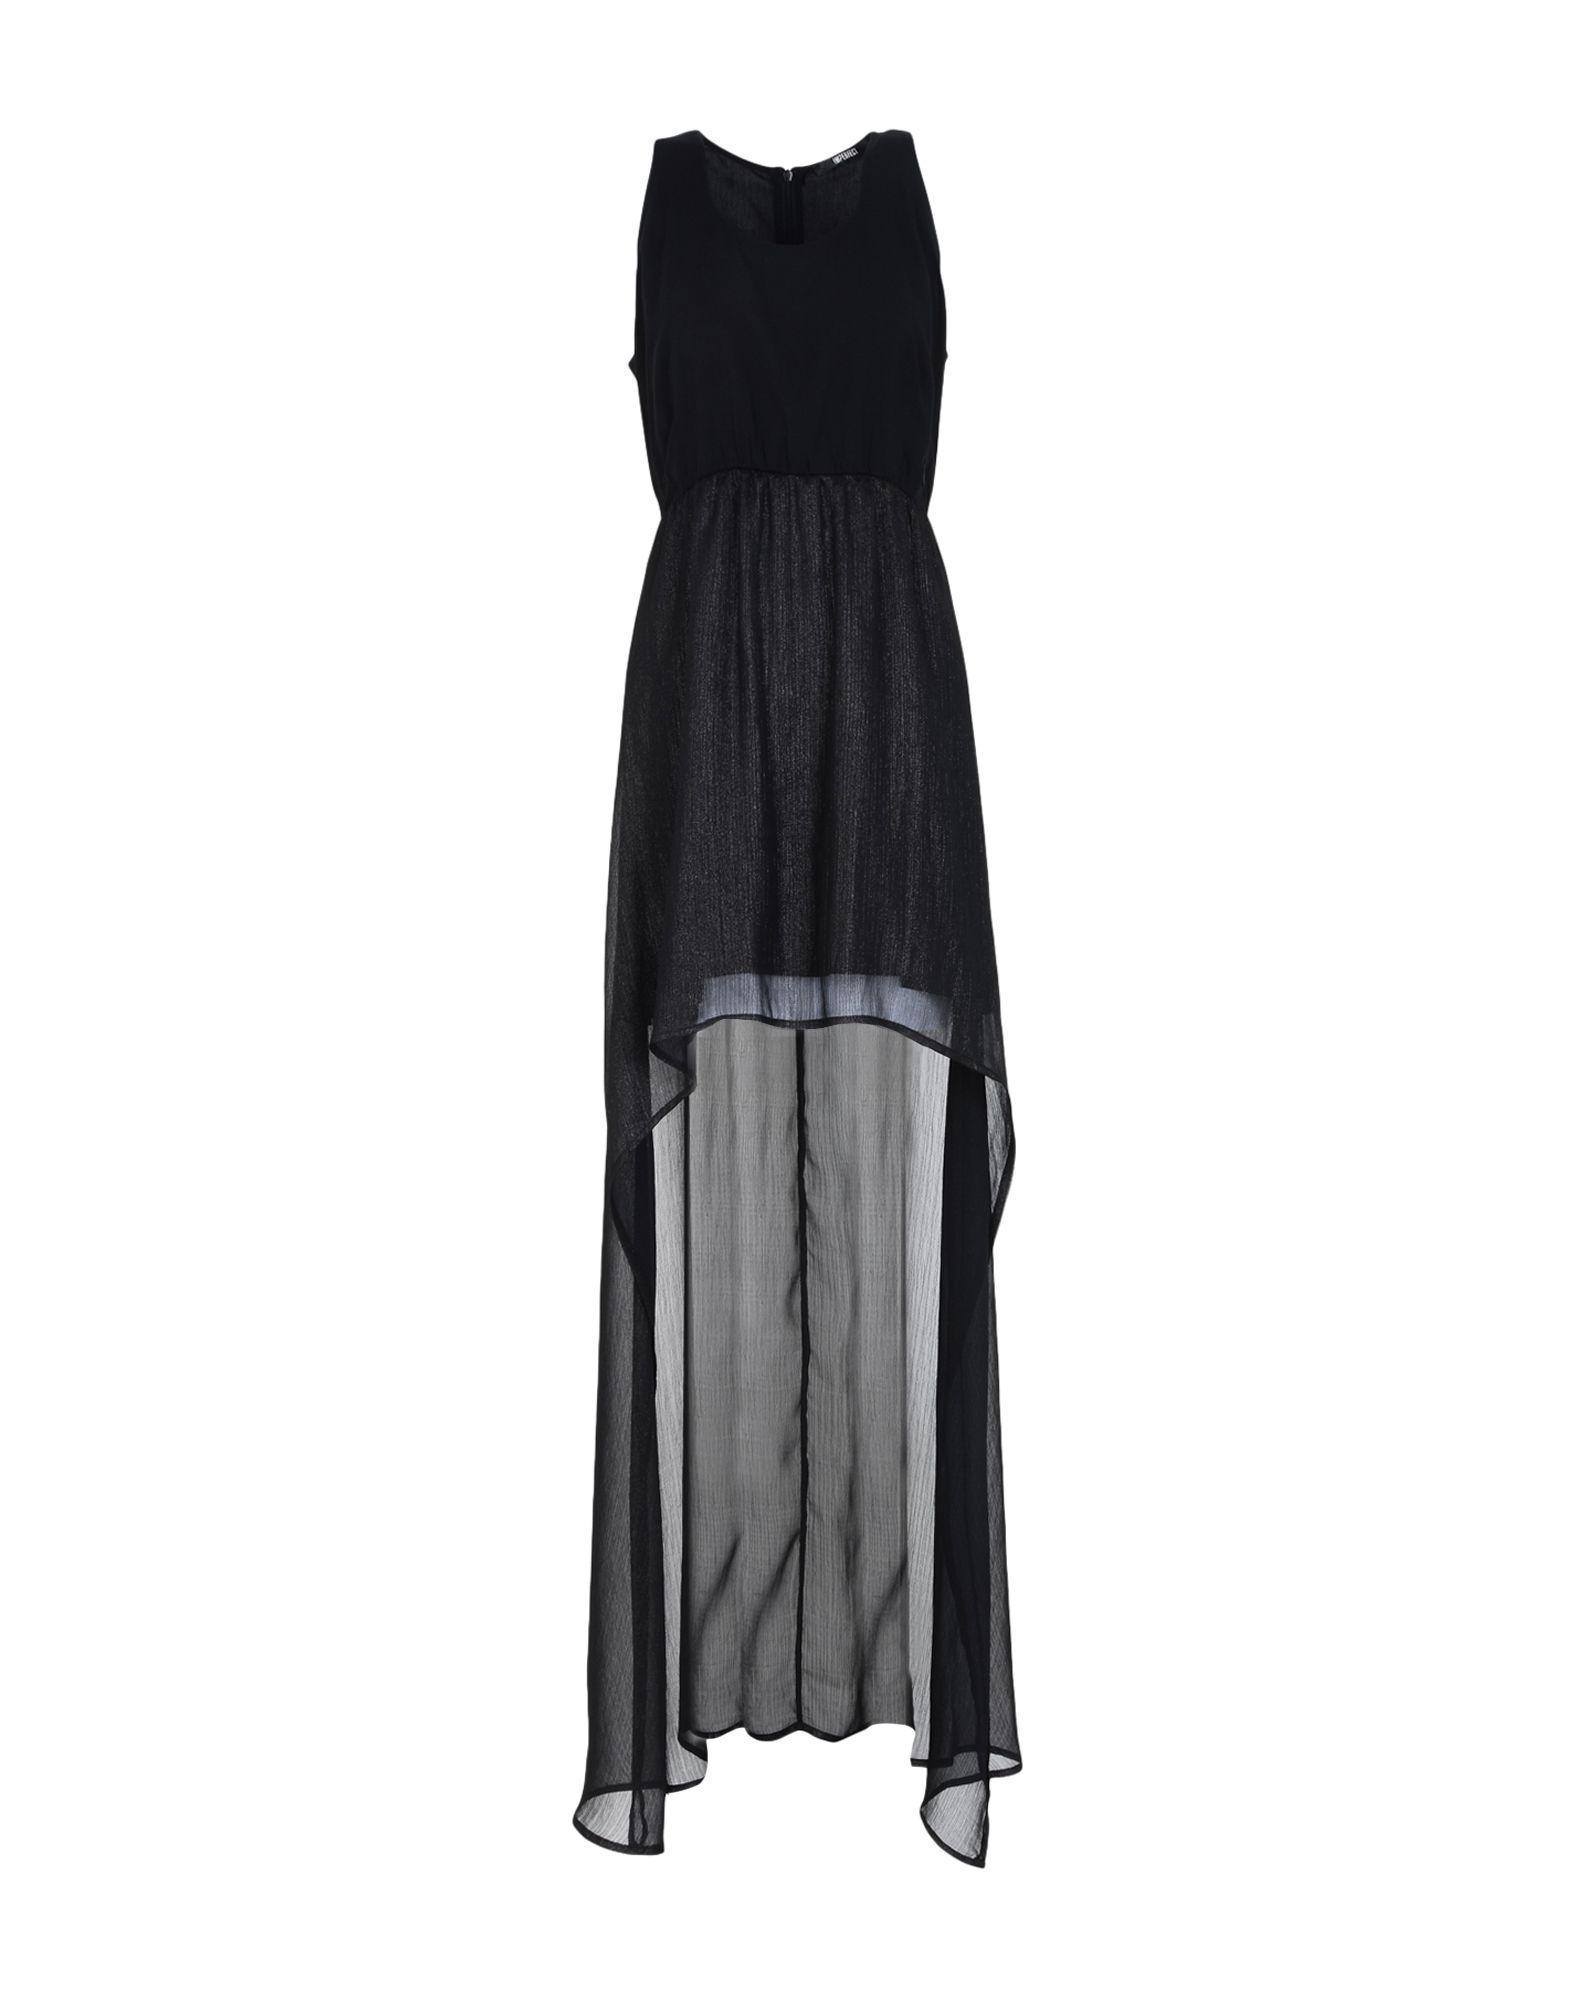 !M?ERFECT Платье длиной 3/4 carbon fiber front bumper lip splitter spoiler for bmw 3 series gt f34 m sport bumper 4 door 14 17 grey frp 2pc 335i 340i gt